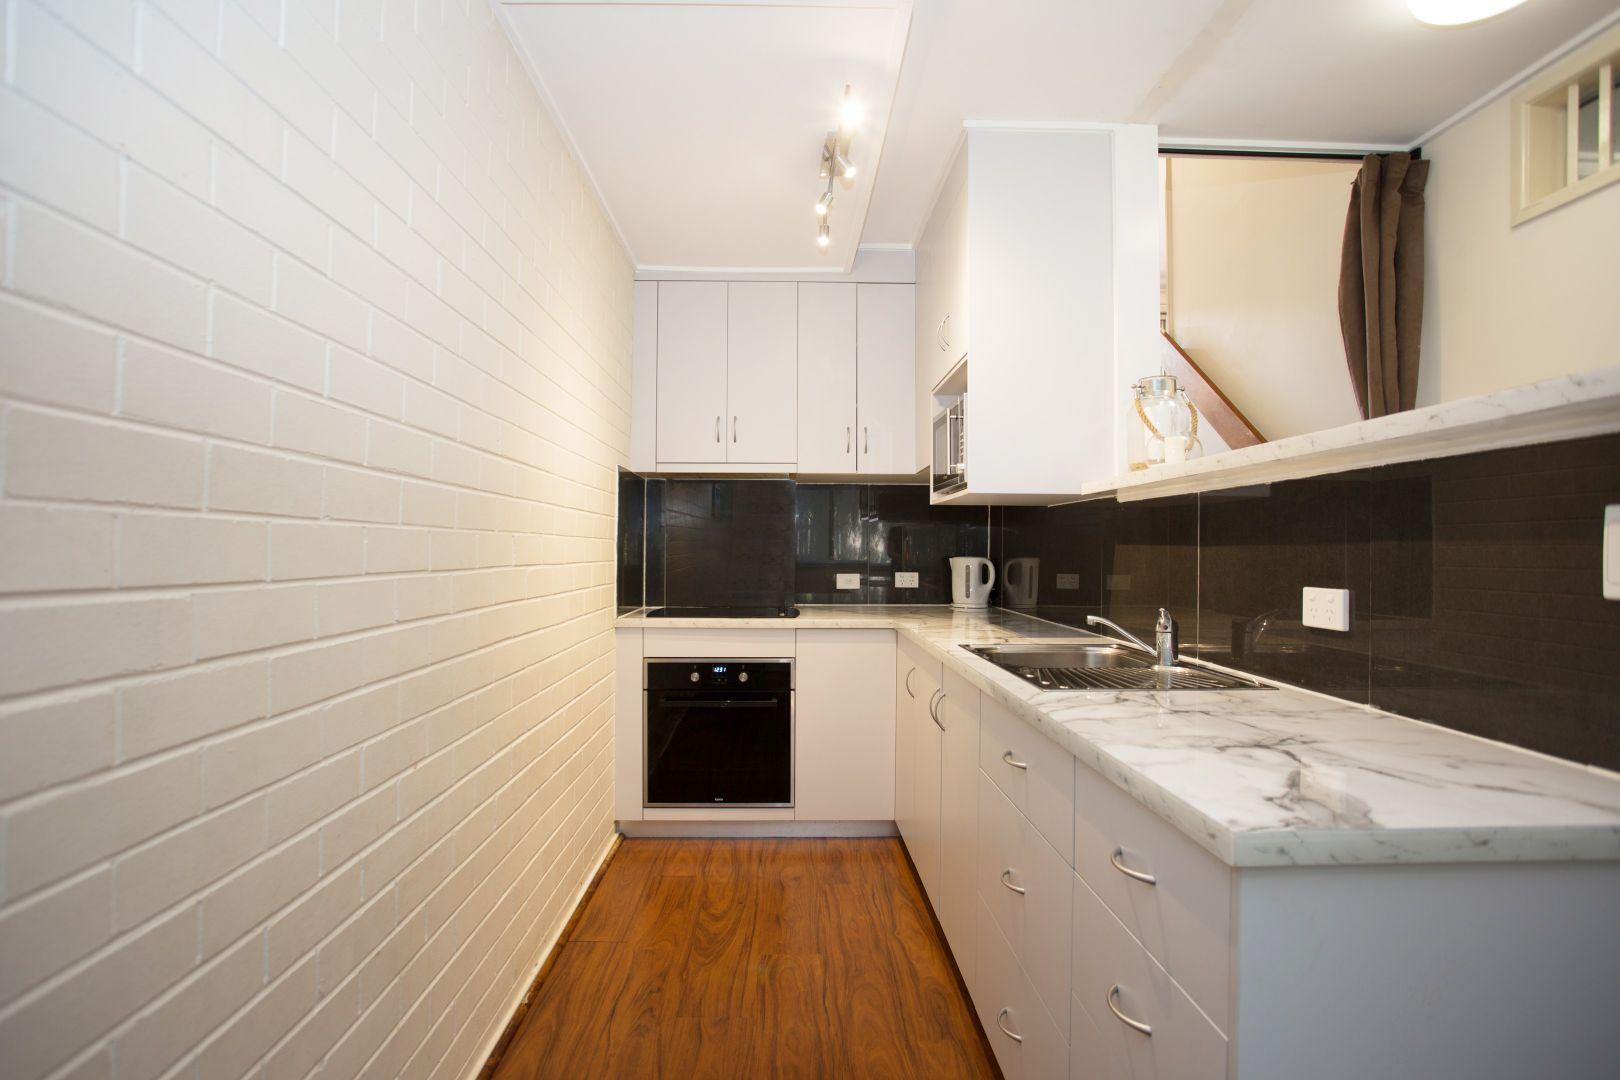 2/82 Evan Street, Mackay QLD 4740